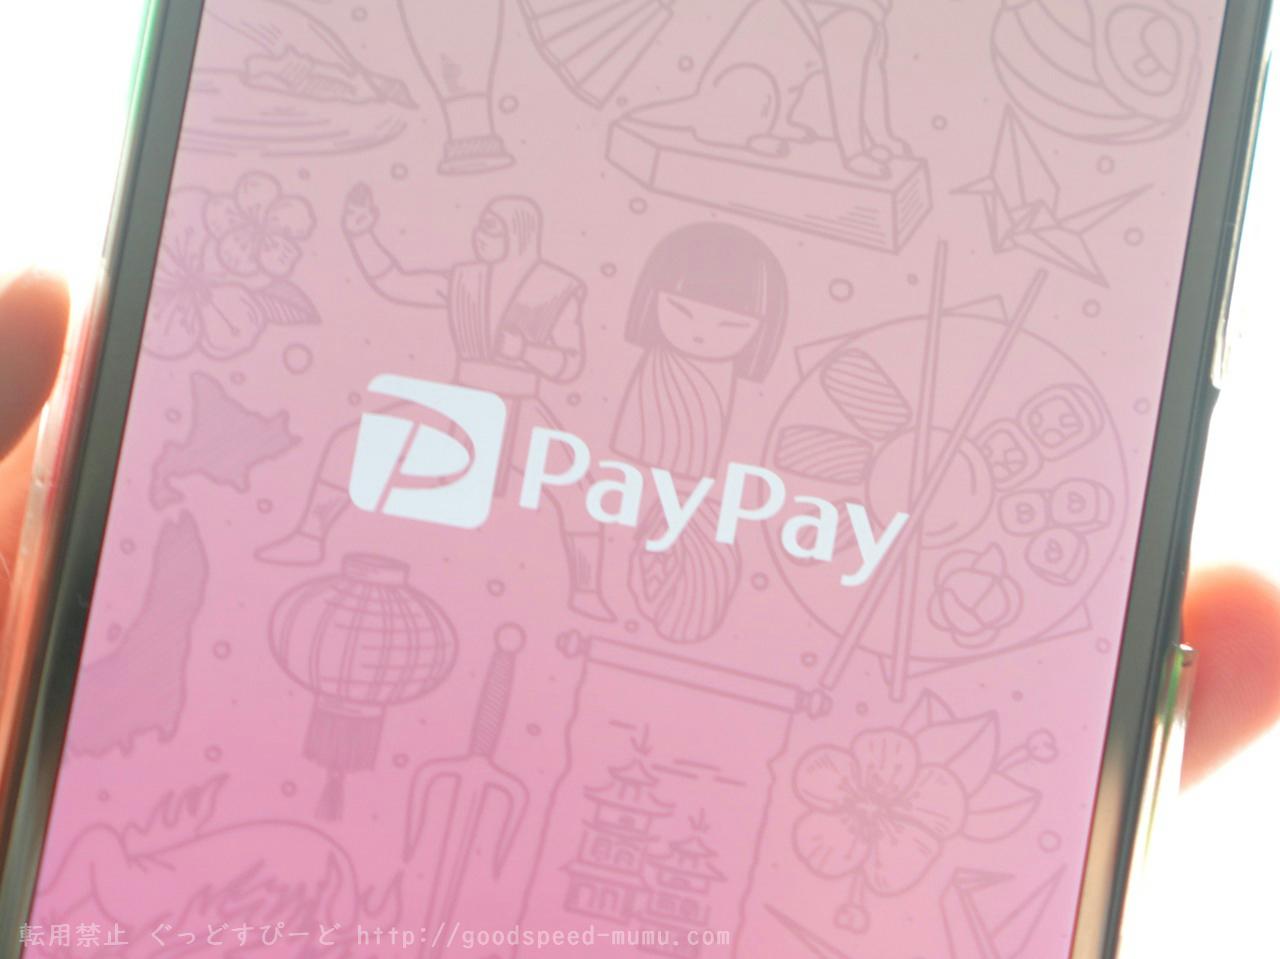 PayPayを使い始める